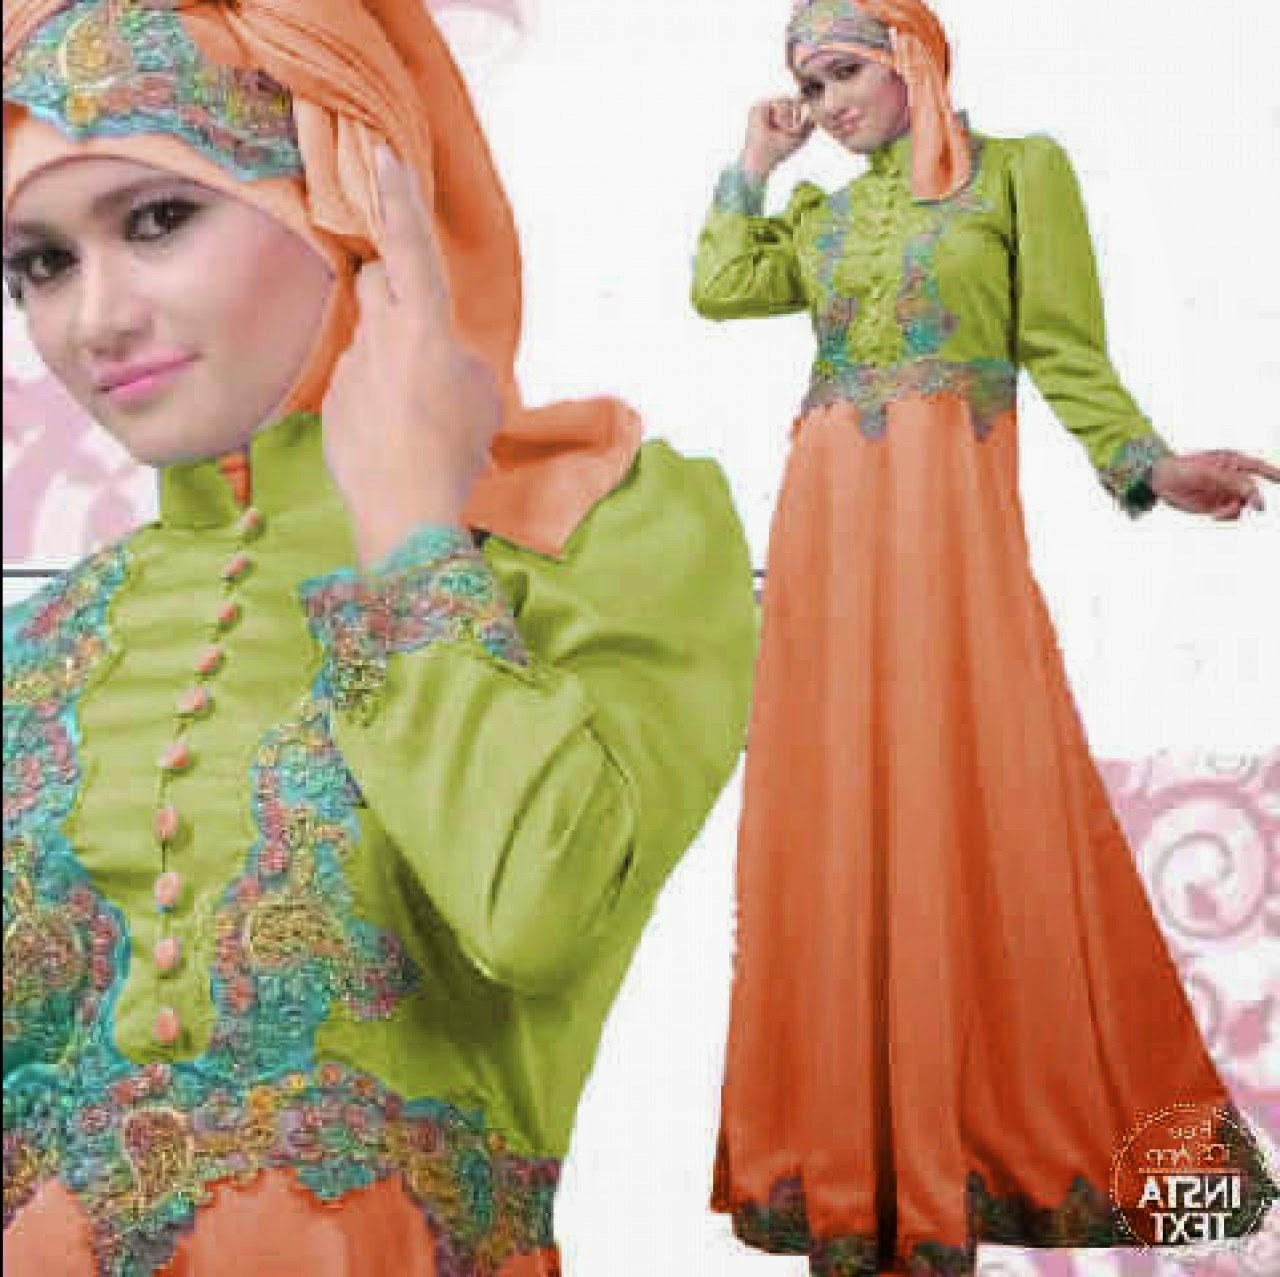 Bentuk Model Baju Lebaran Wanita Terbaru S5d8 Kumpulan Foto Model Baju Kebaya Lebaran Terbaru 2018